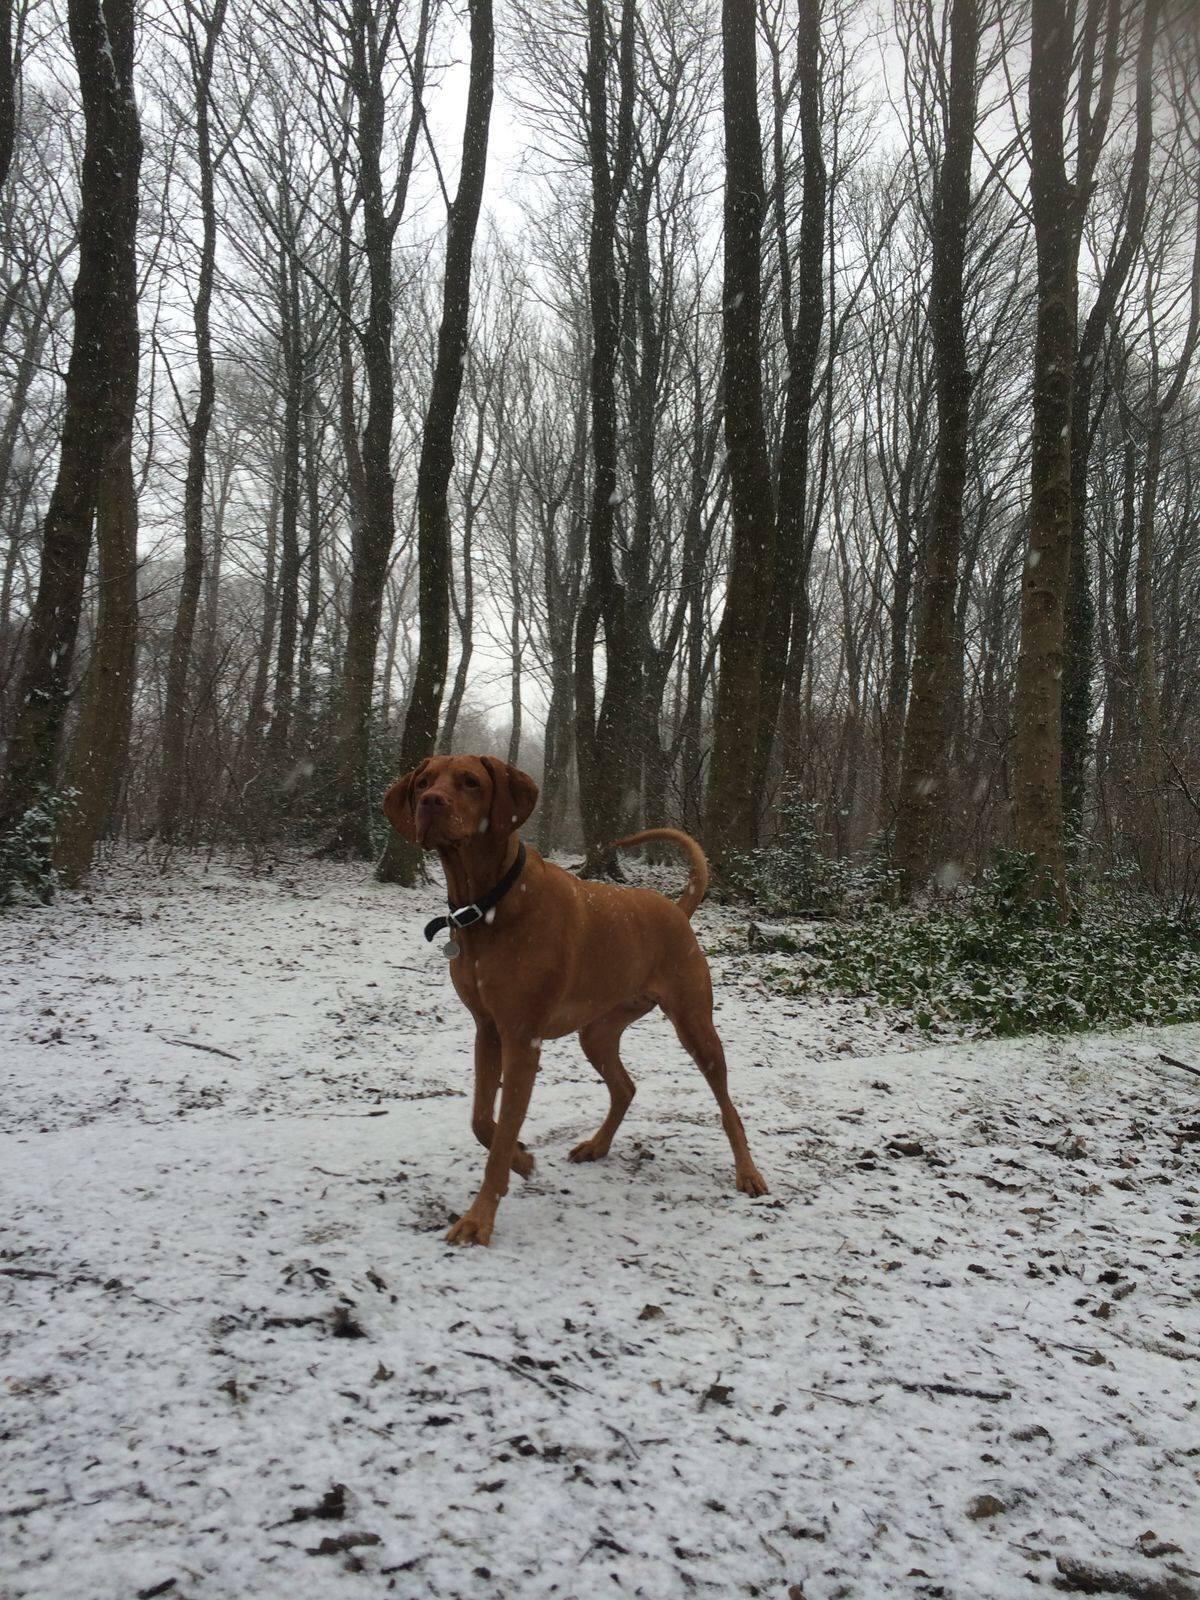 Kaya in the snow